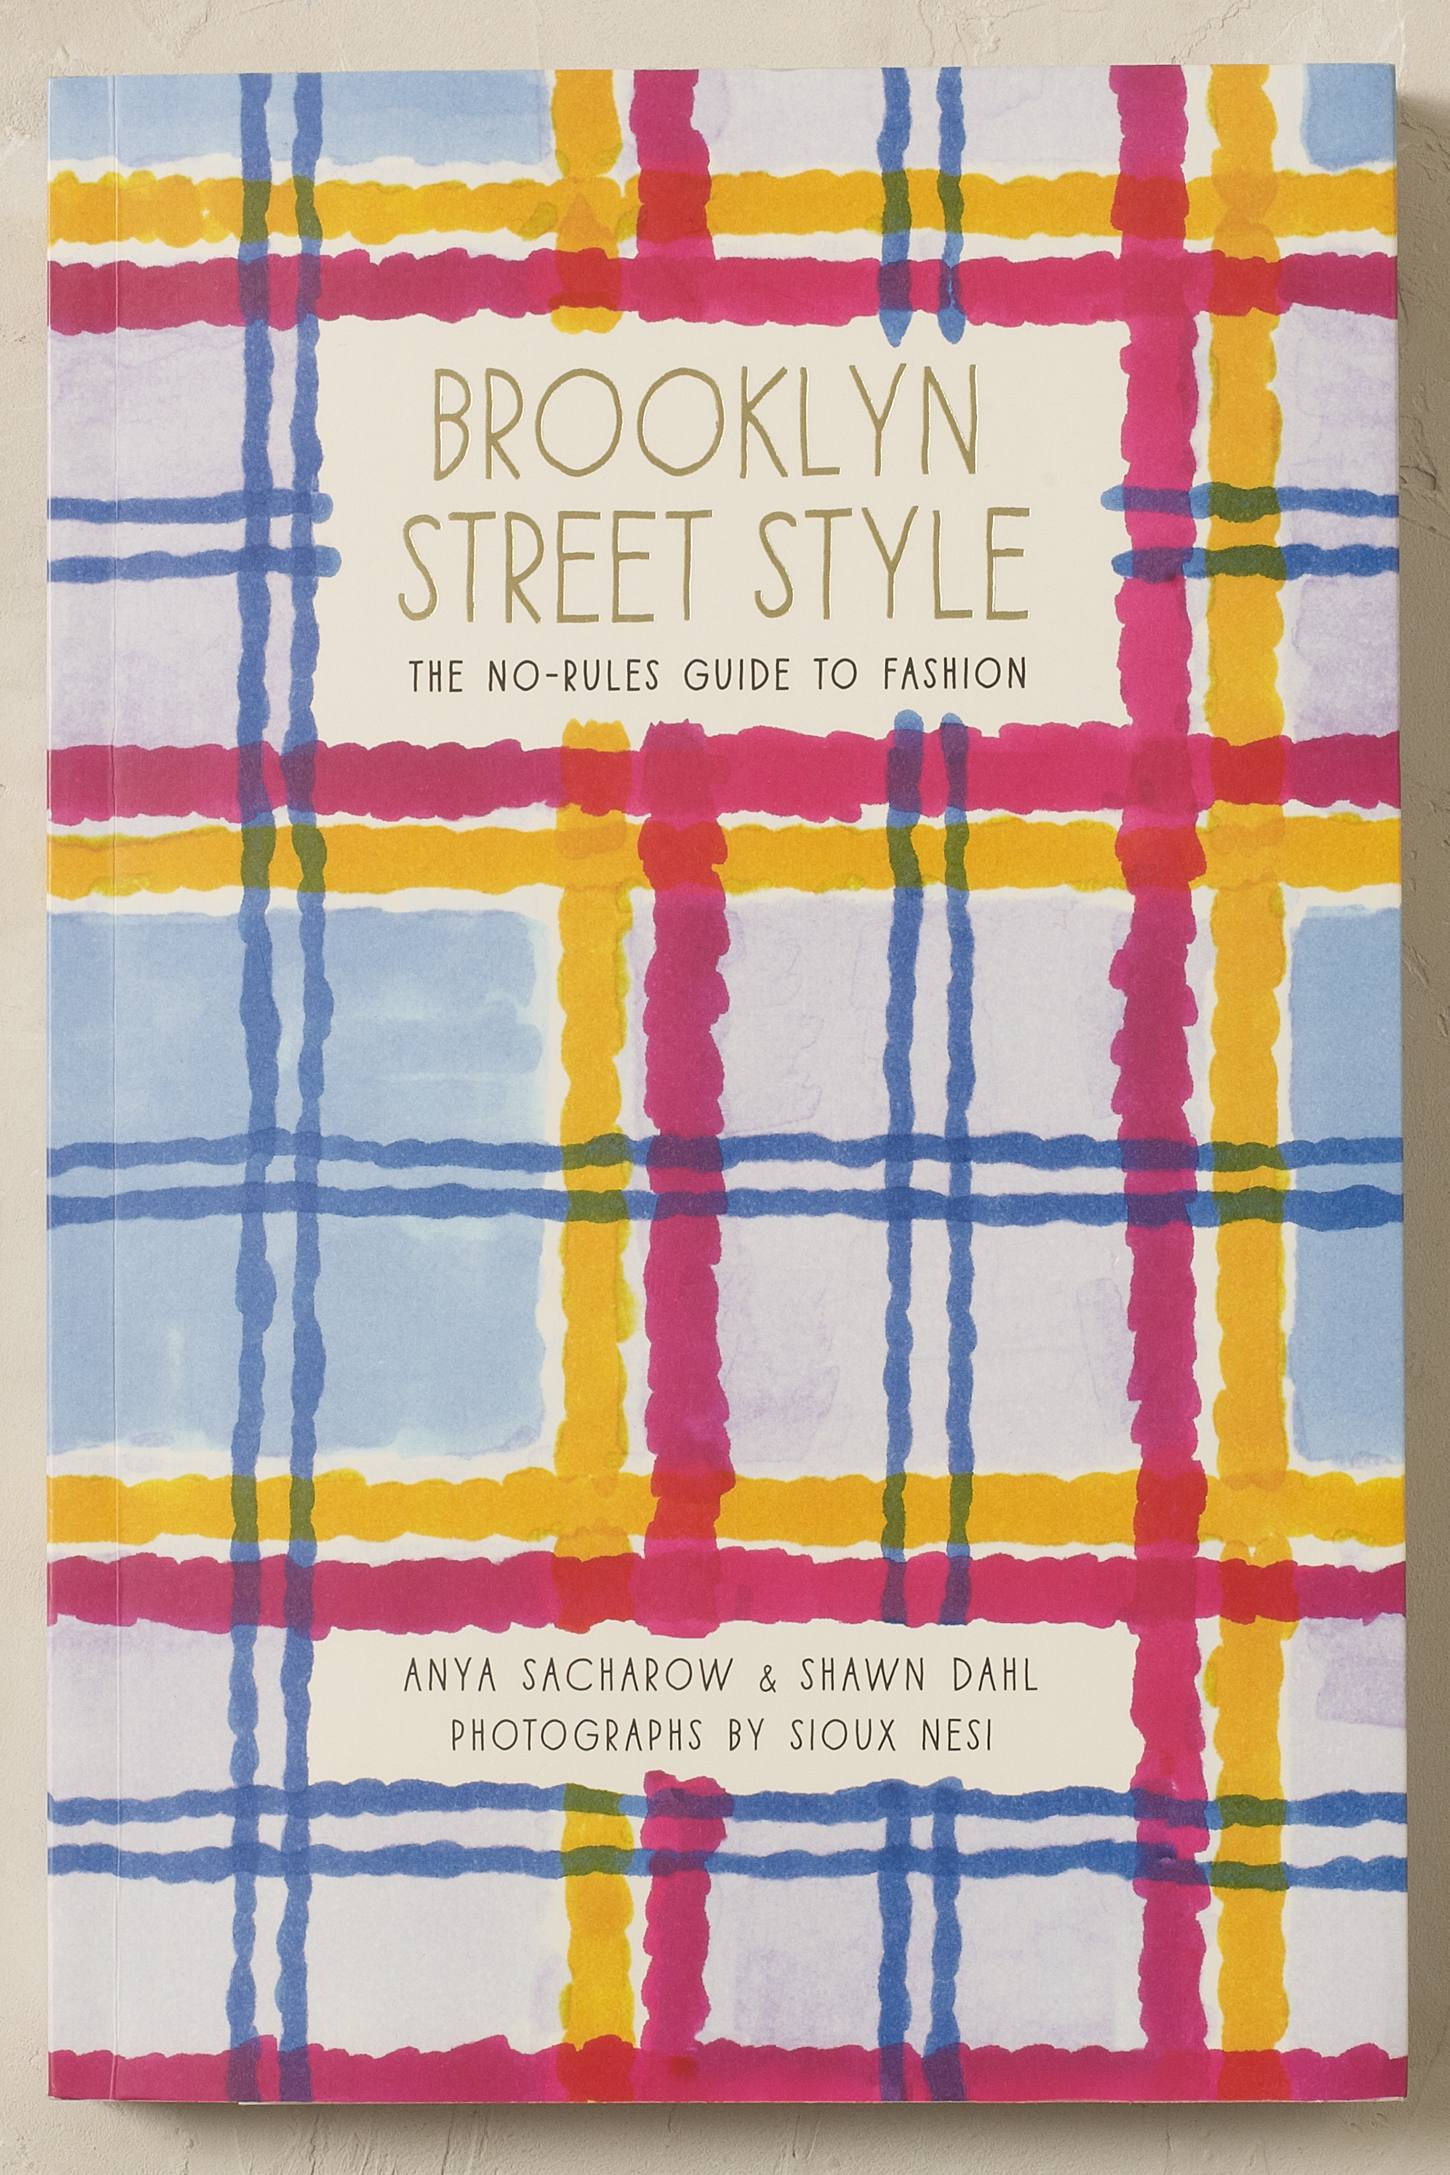 Brooklyn Street Style